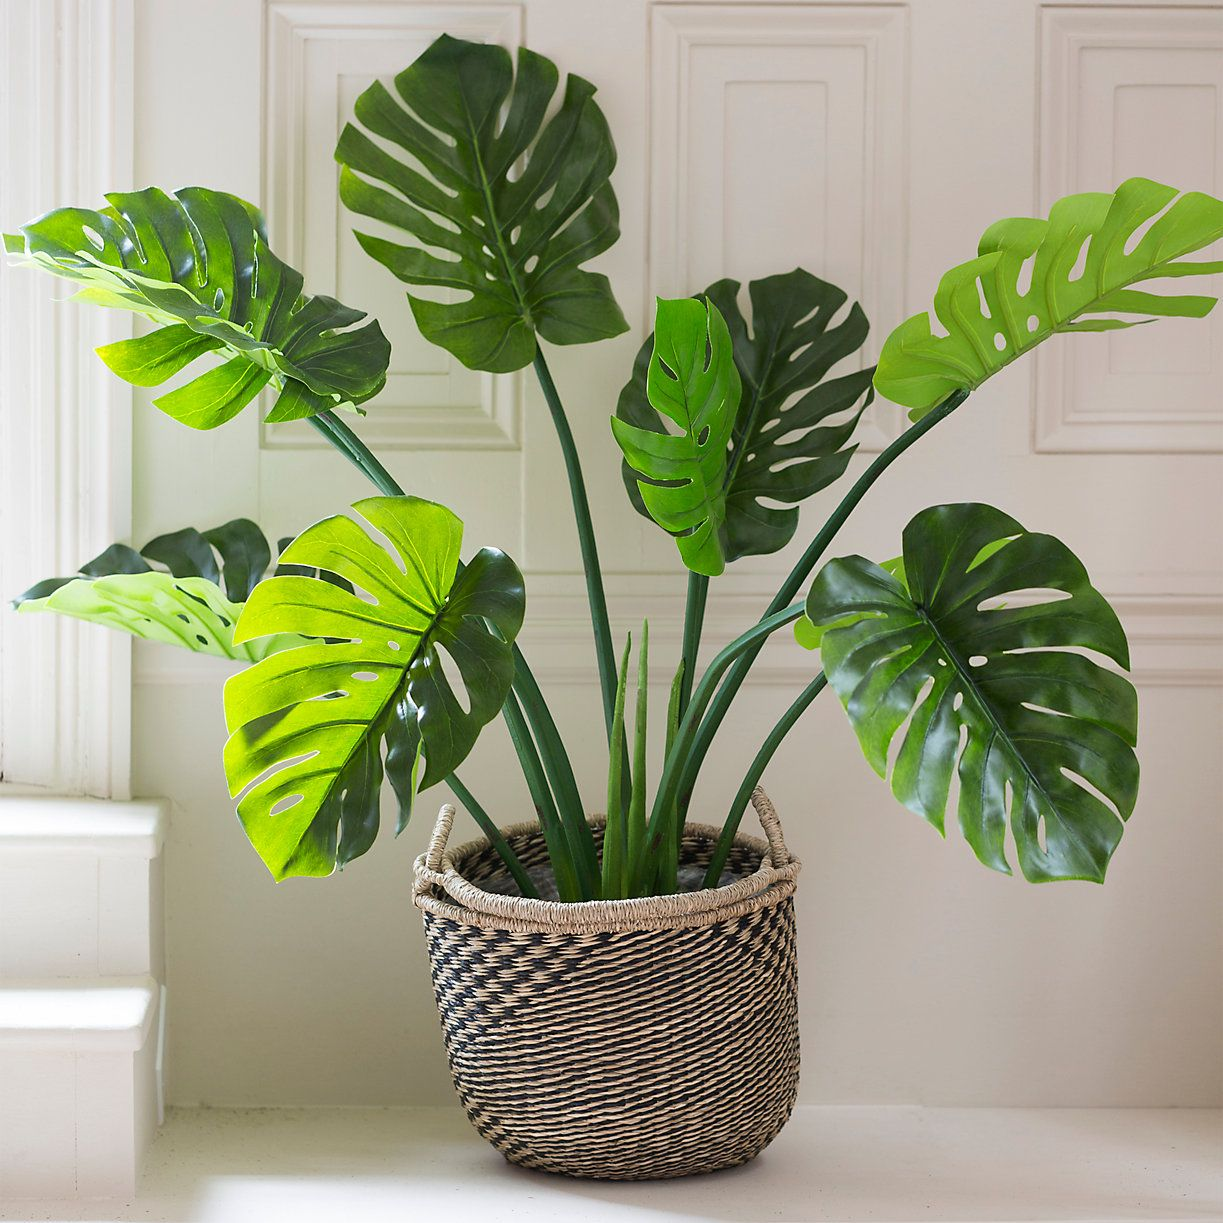 Woven Seagrass Basket Pot Terrain Plants Natural Baskets